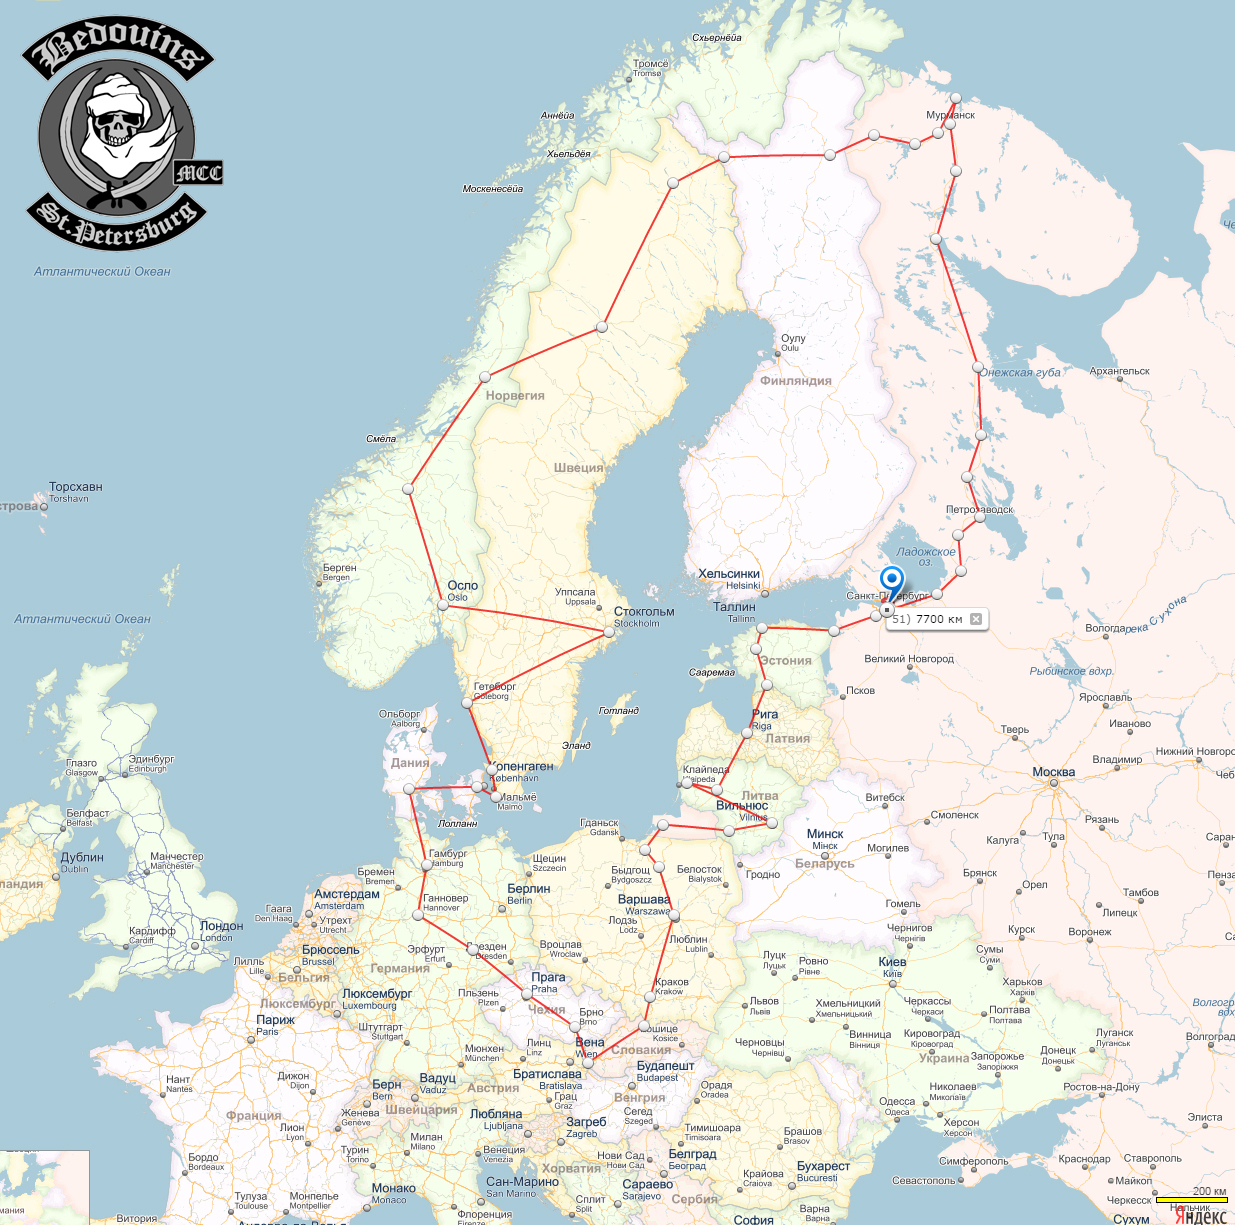 12.06-12.07.2015, МОТО-путешествие по Скандинавии, Европе, Прибалтике